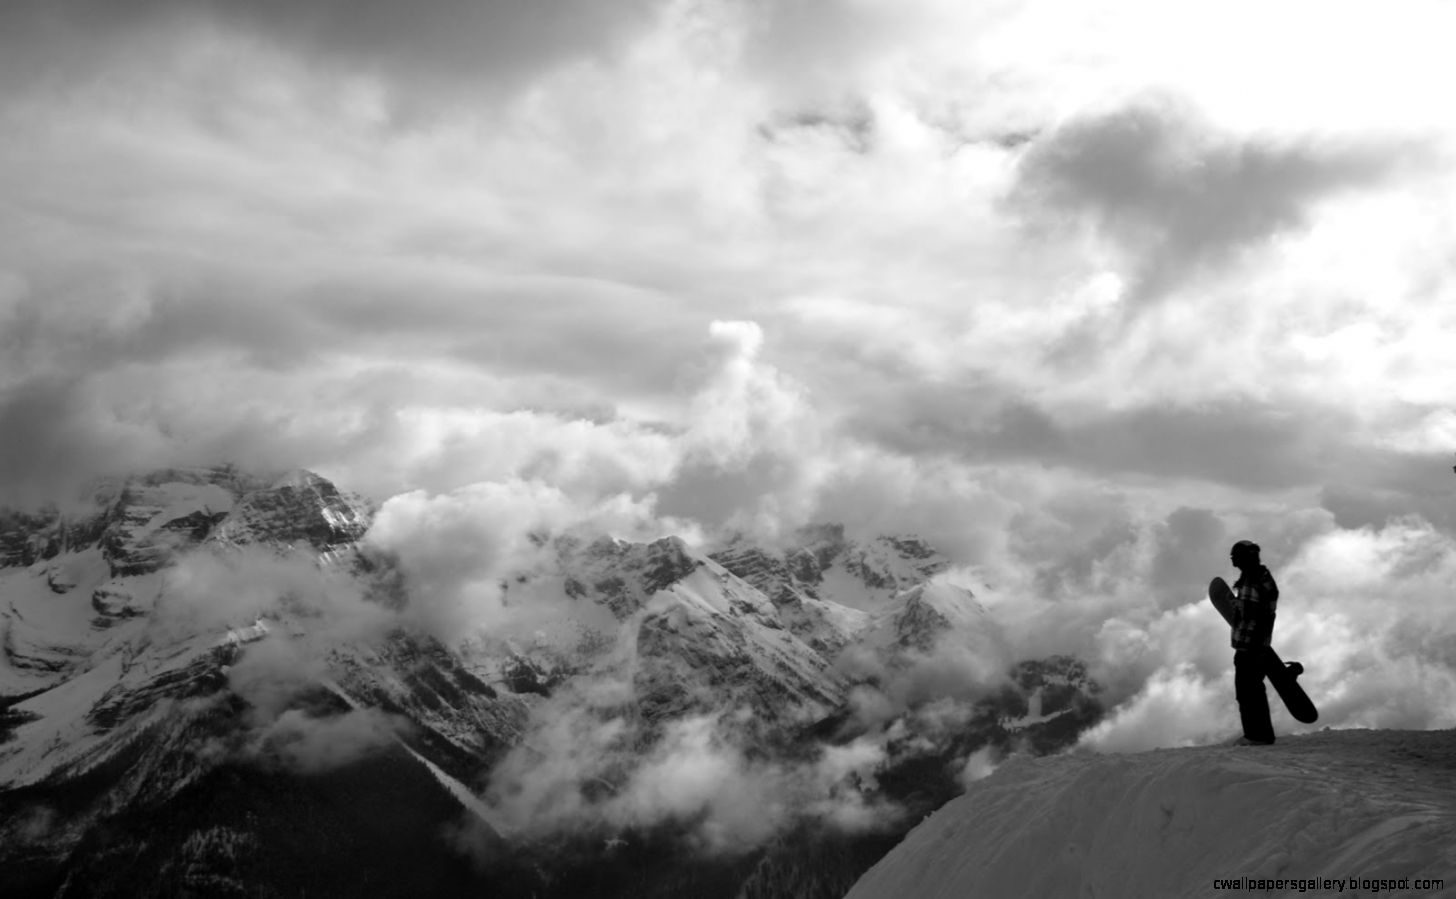 Snowboarding Mountain Desktop Backgrounds